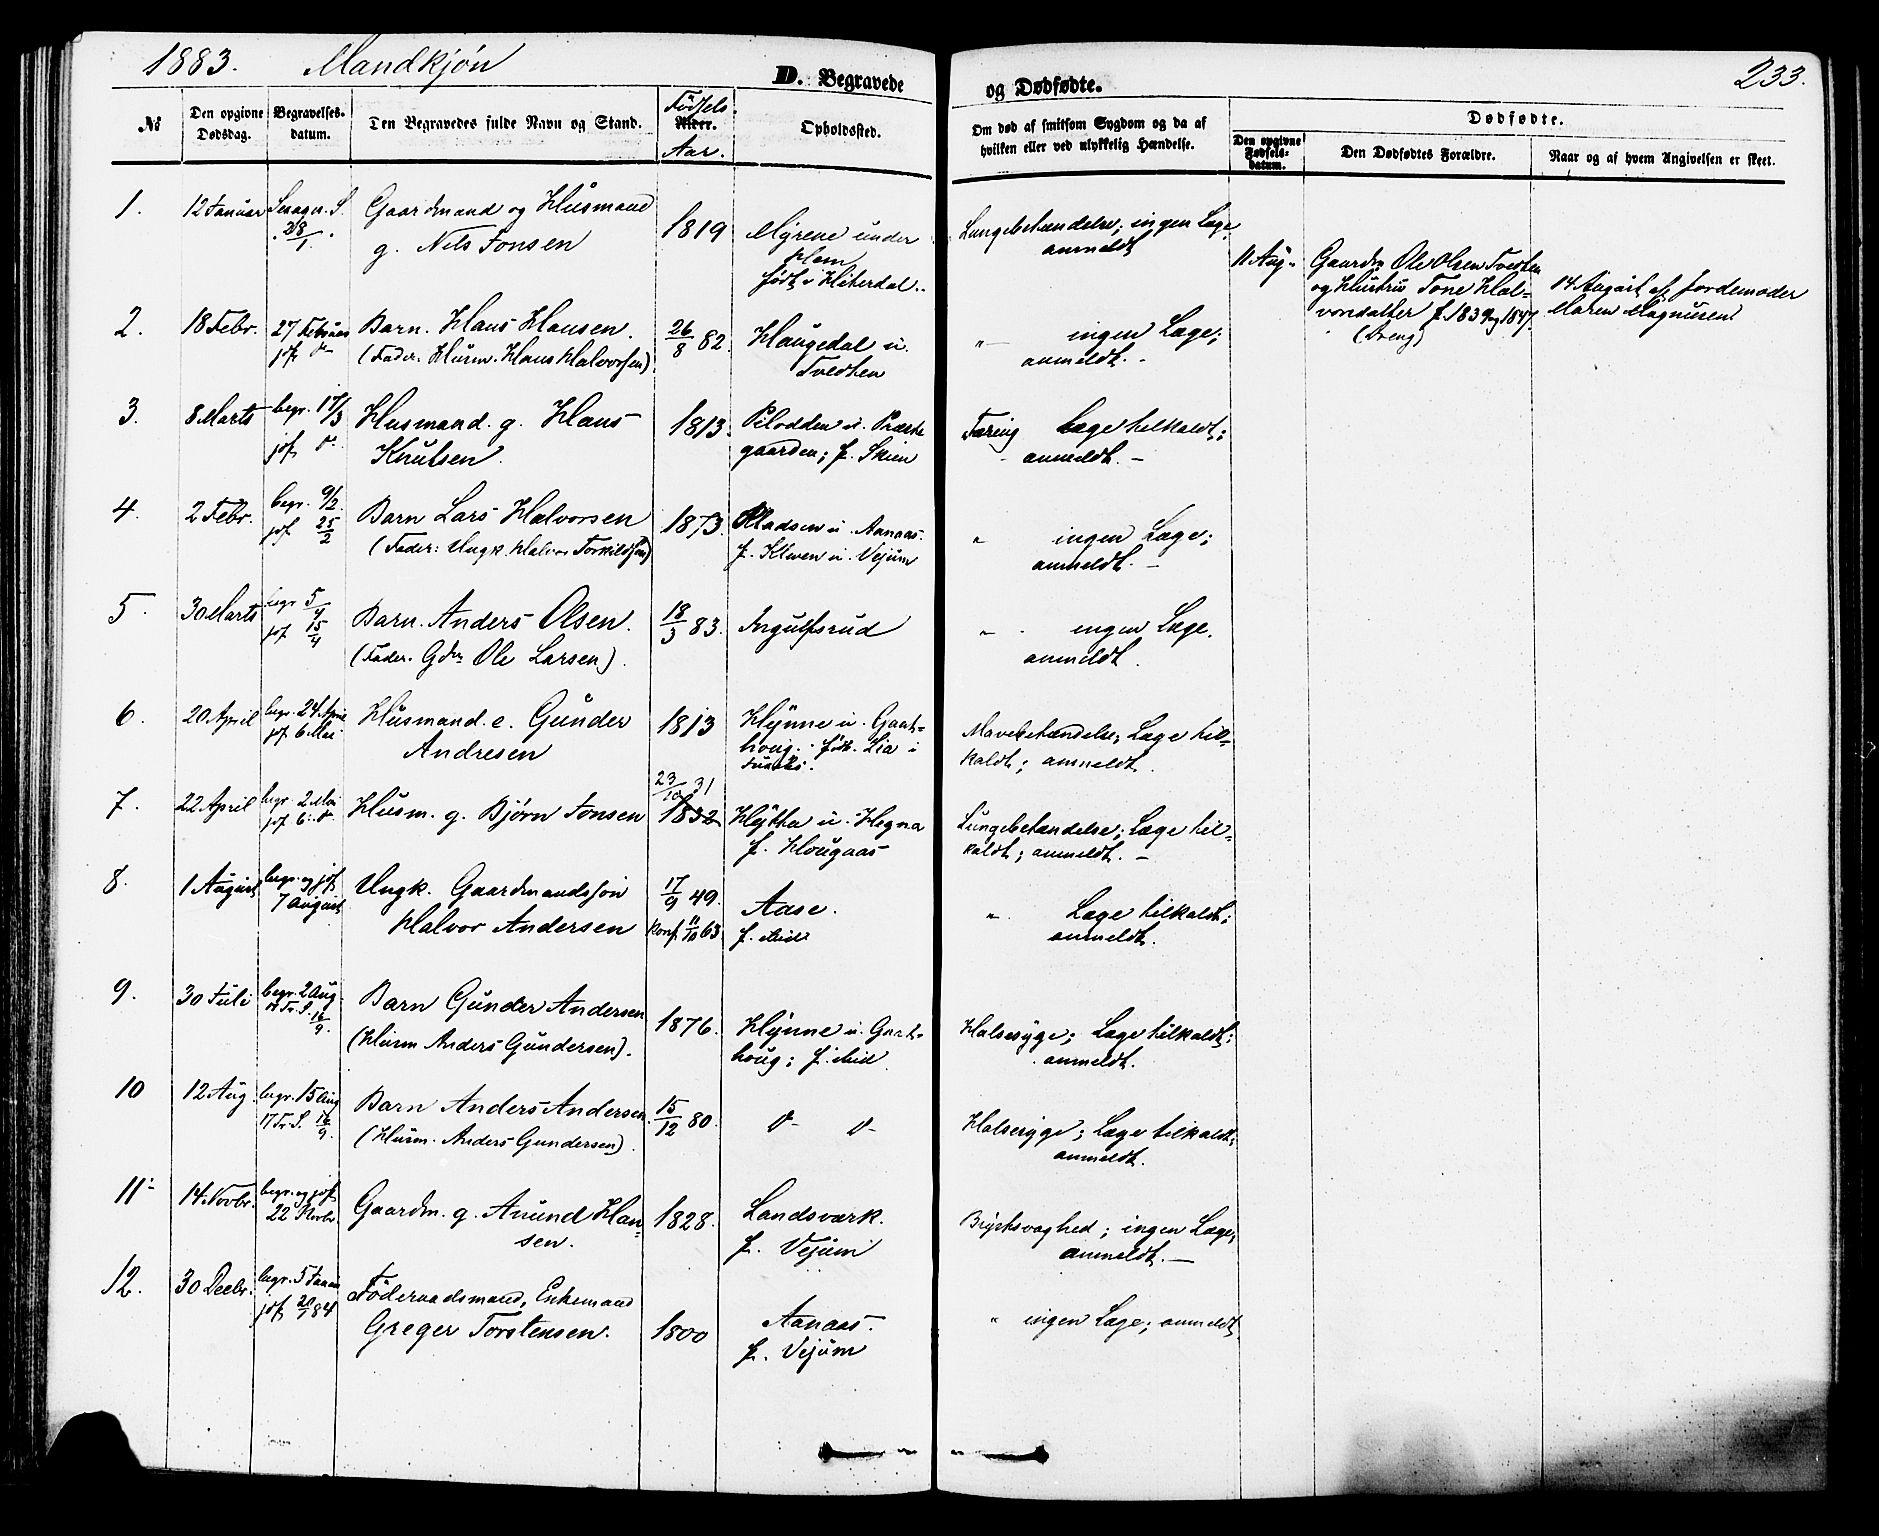 SAKO, Sauherad kirkebøker, F/Fa/L0008: Ministerialbok nr. I 8, 1873-1886, s. 233